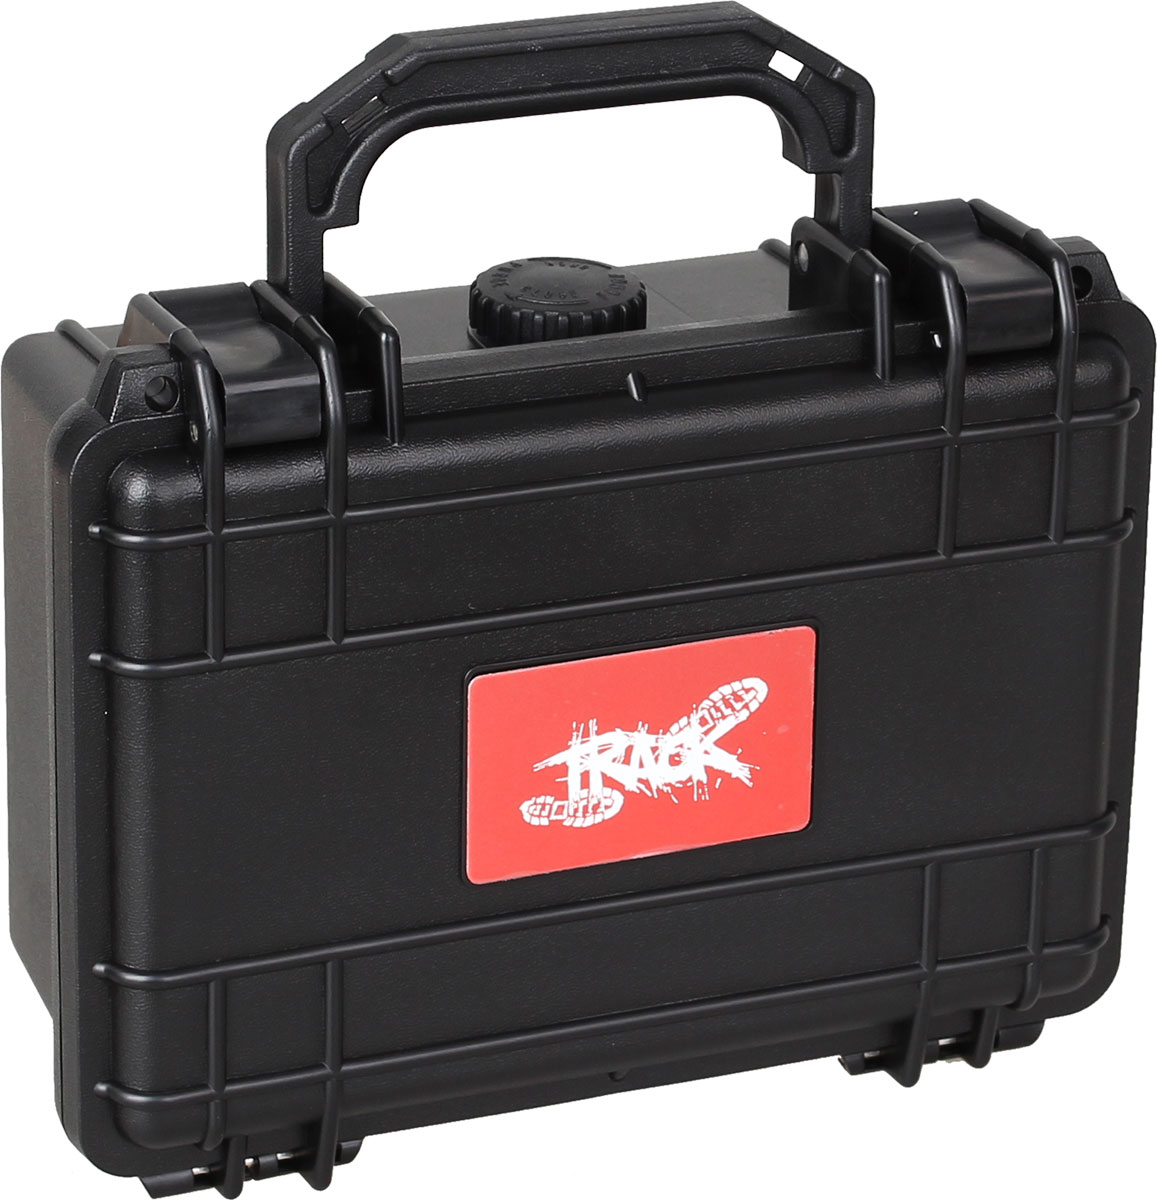 Кейс ударопрочный Track 210, 21 х 16,7 х 9 см кейс для хранения pacchetto medio 56 х 33 х 17 см